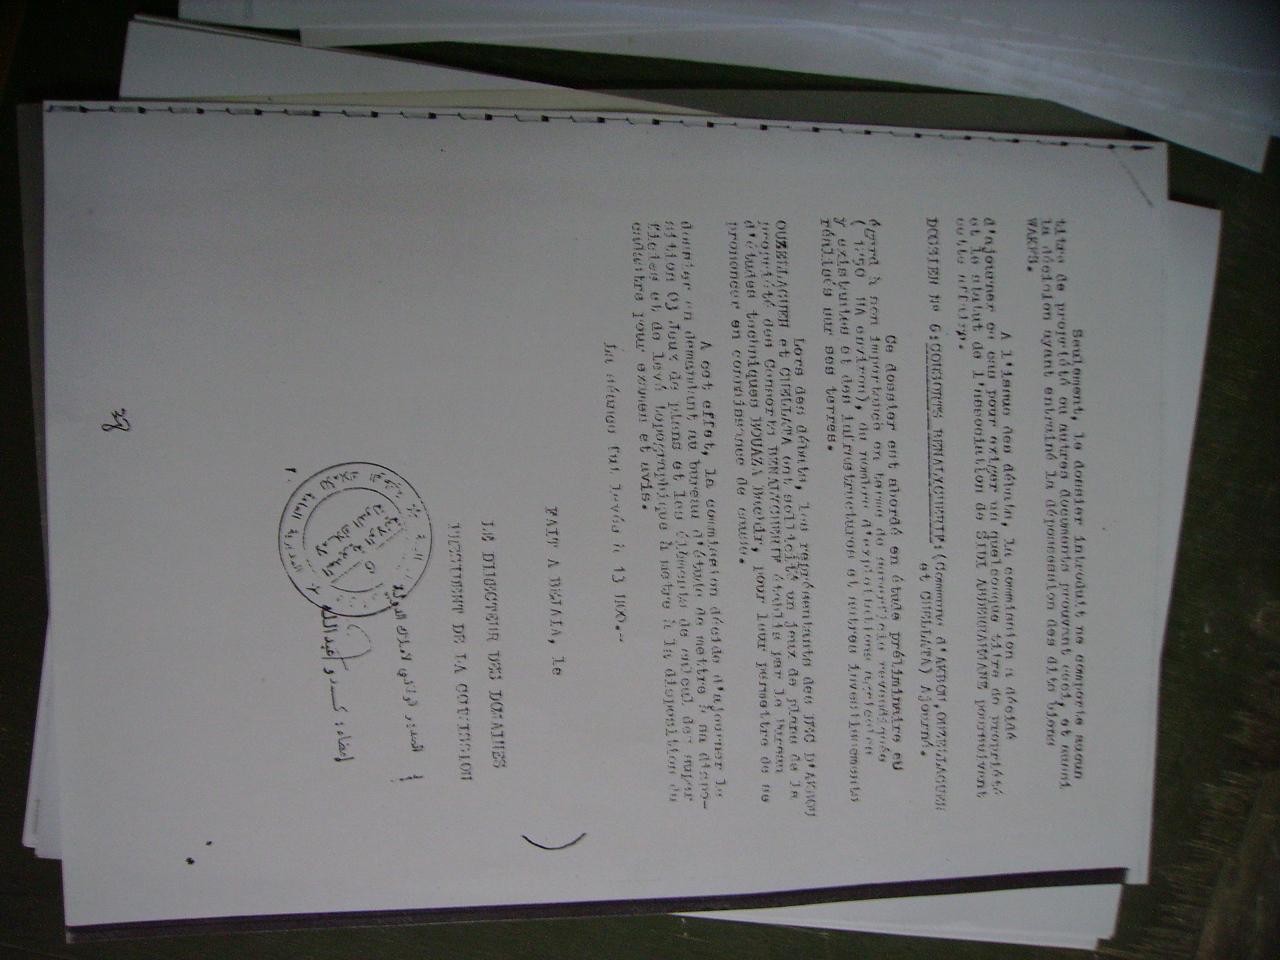 pvrunioncommissionrestitution10mai1997p5.jpg